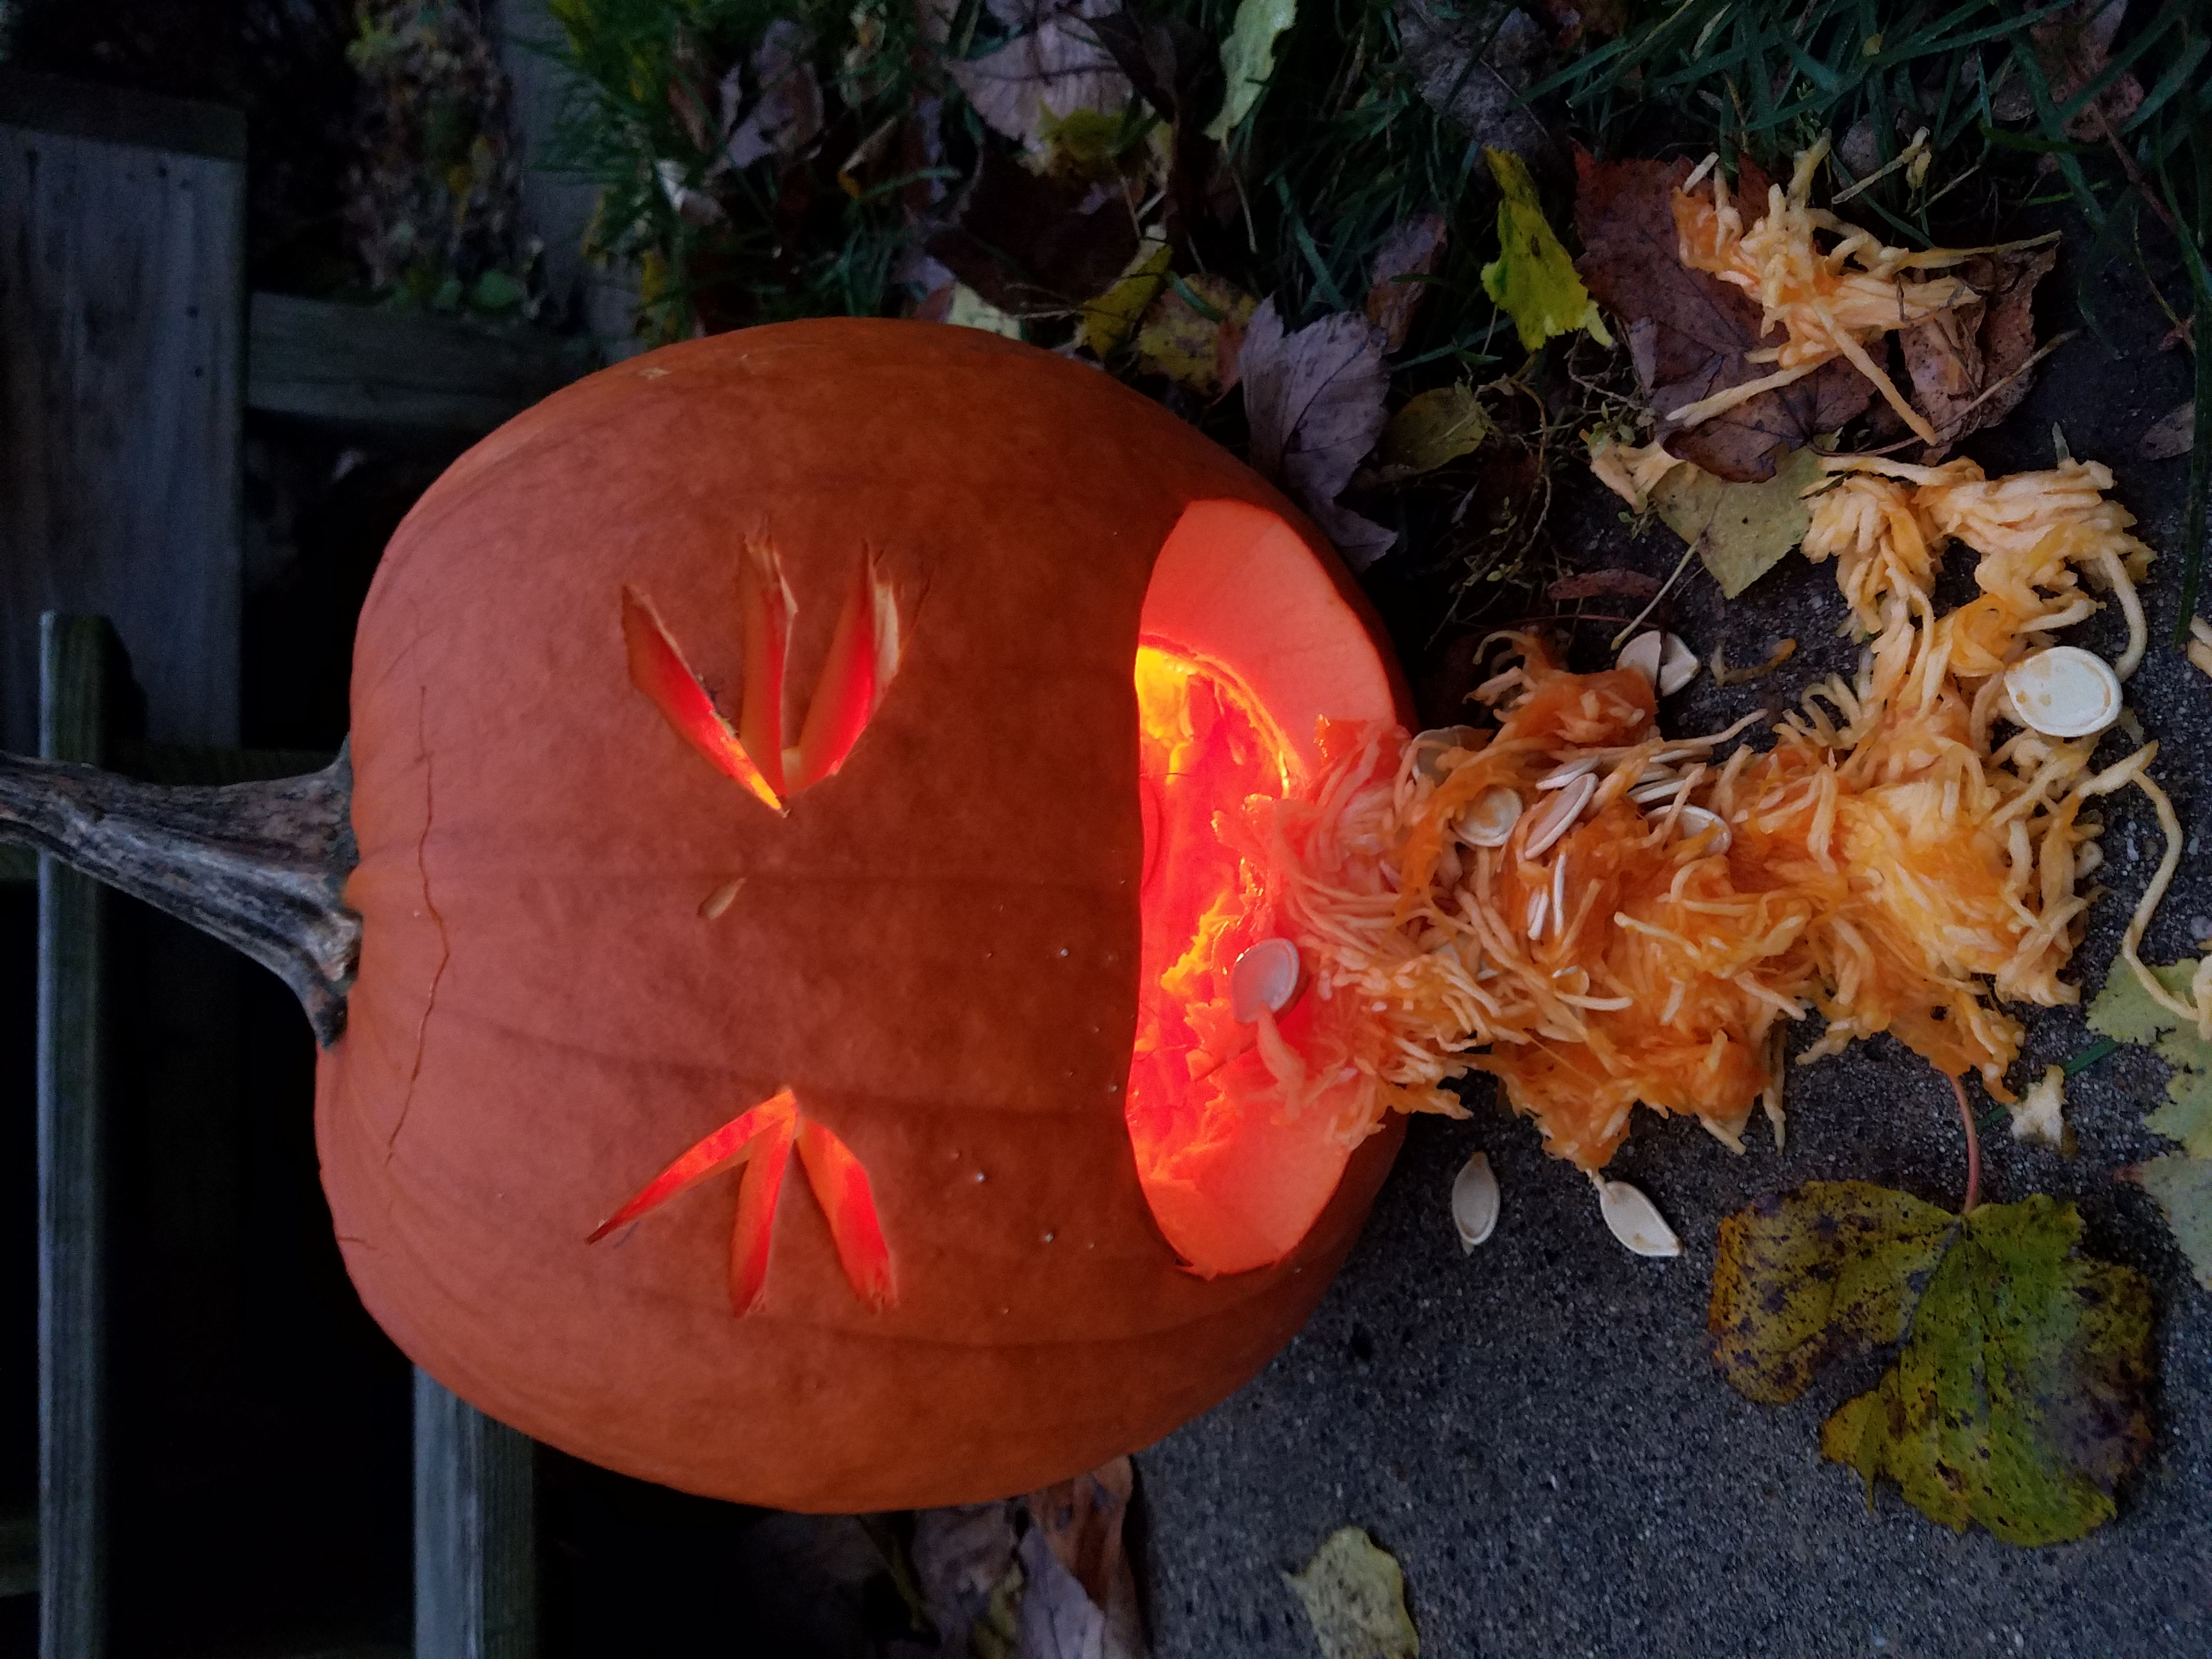 puking-pumpkin-254.jpg